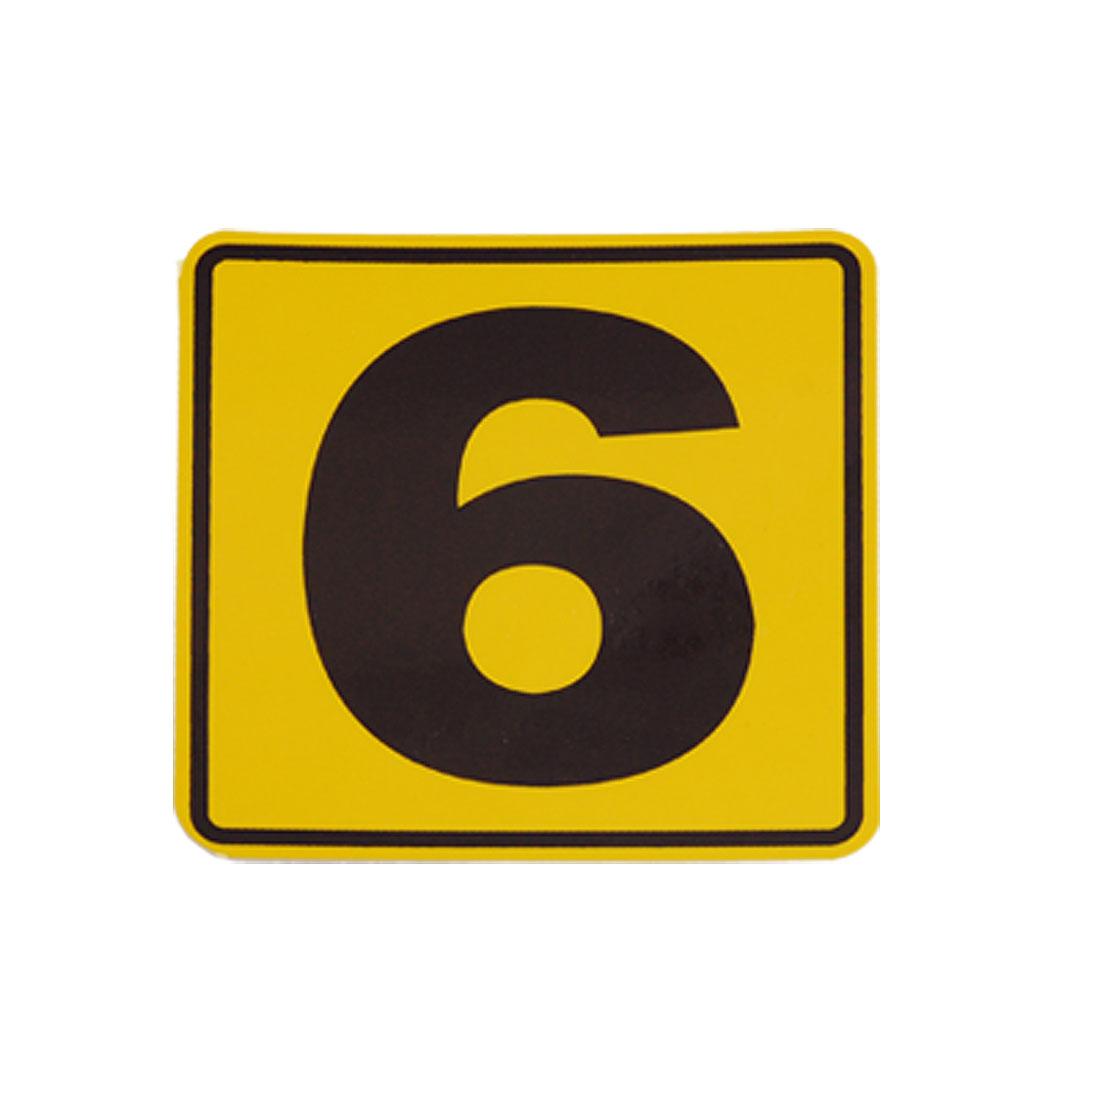 "Unique Bargains 4.4"" x 4.4"" Number 6 Print Car Yellow Black Decal Sticker"